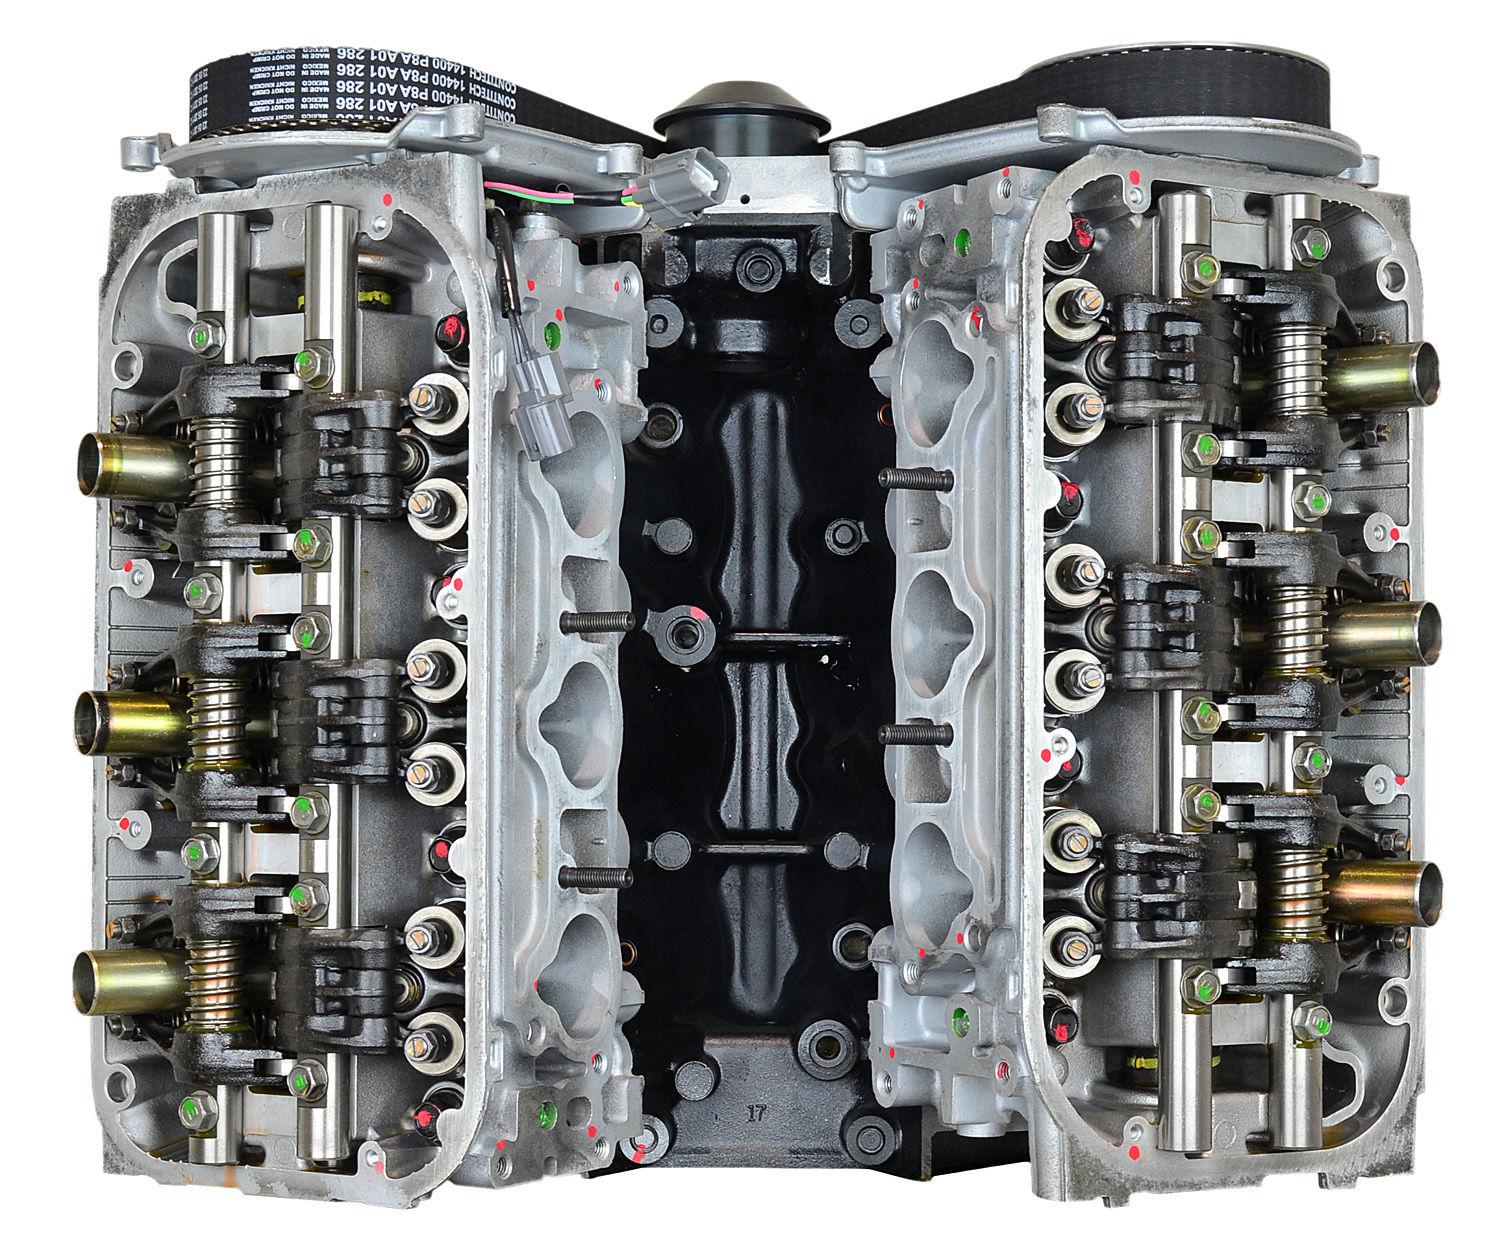 Honda Pilot rebuilt & used engines J35A4, J35A6, J35A9 ...